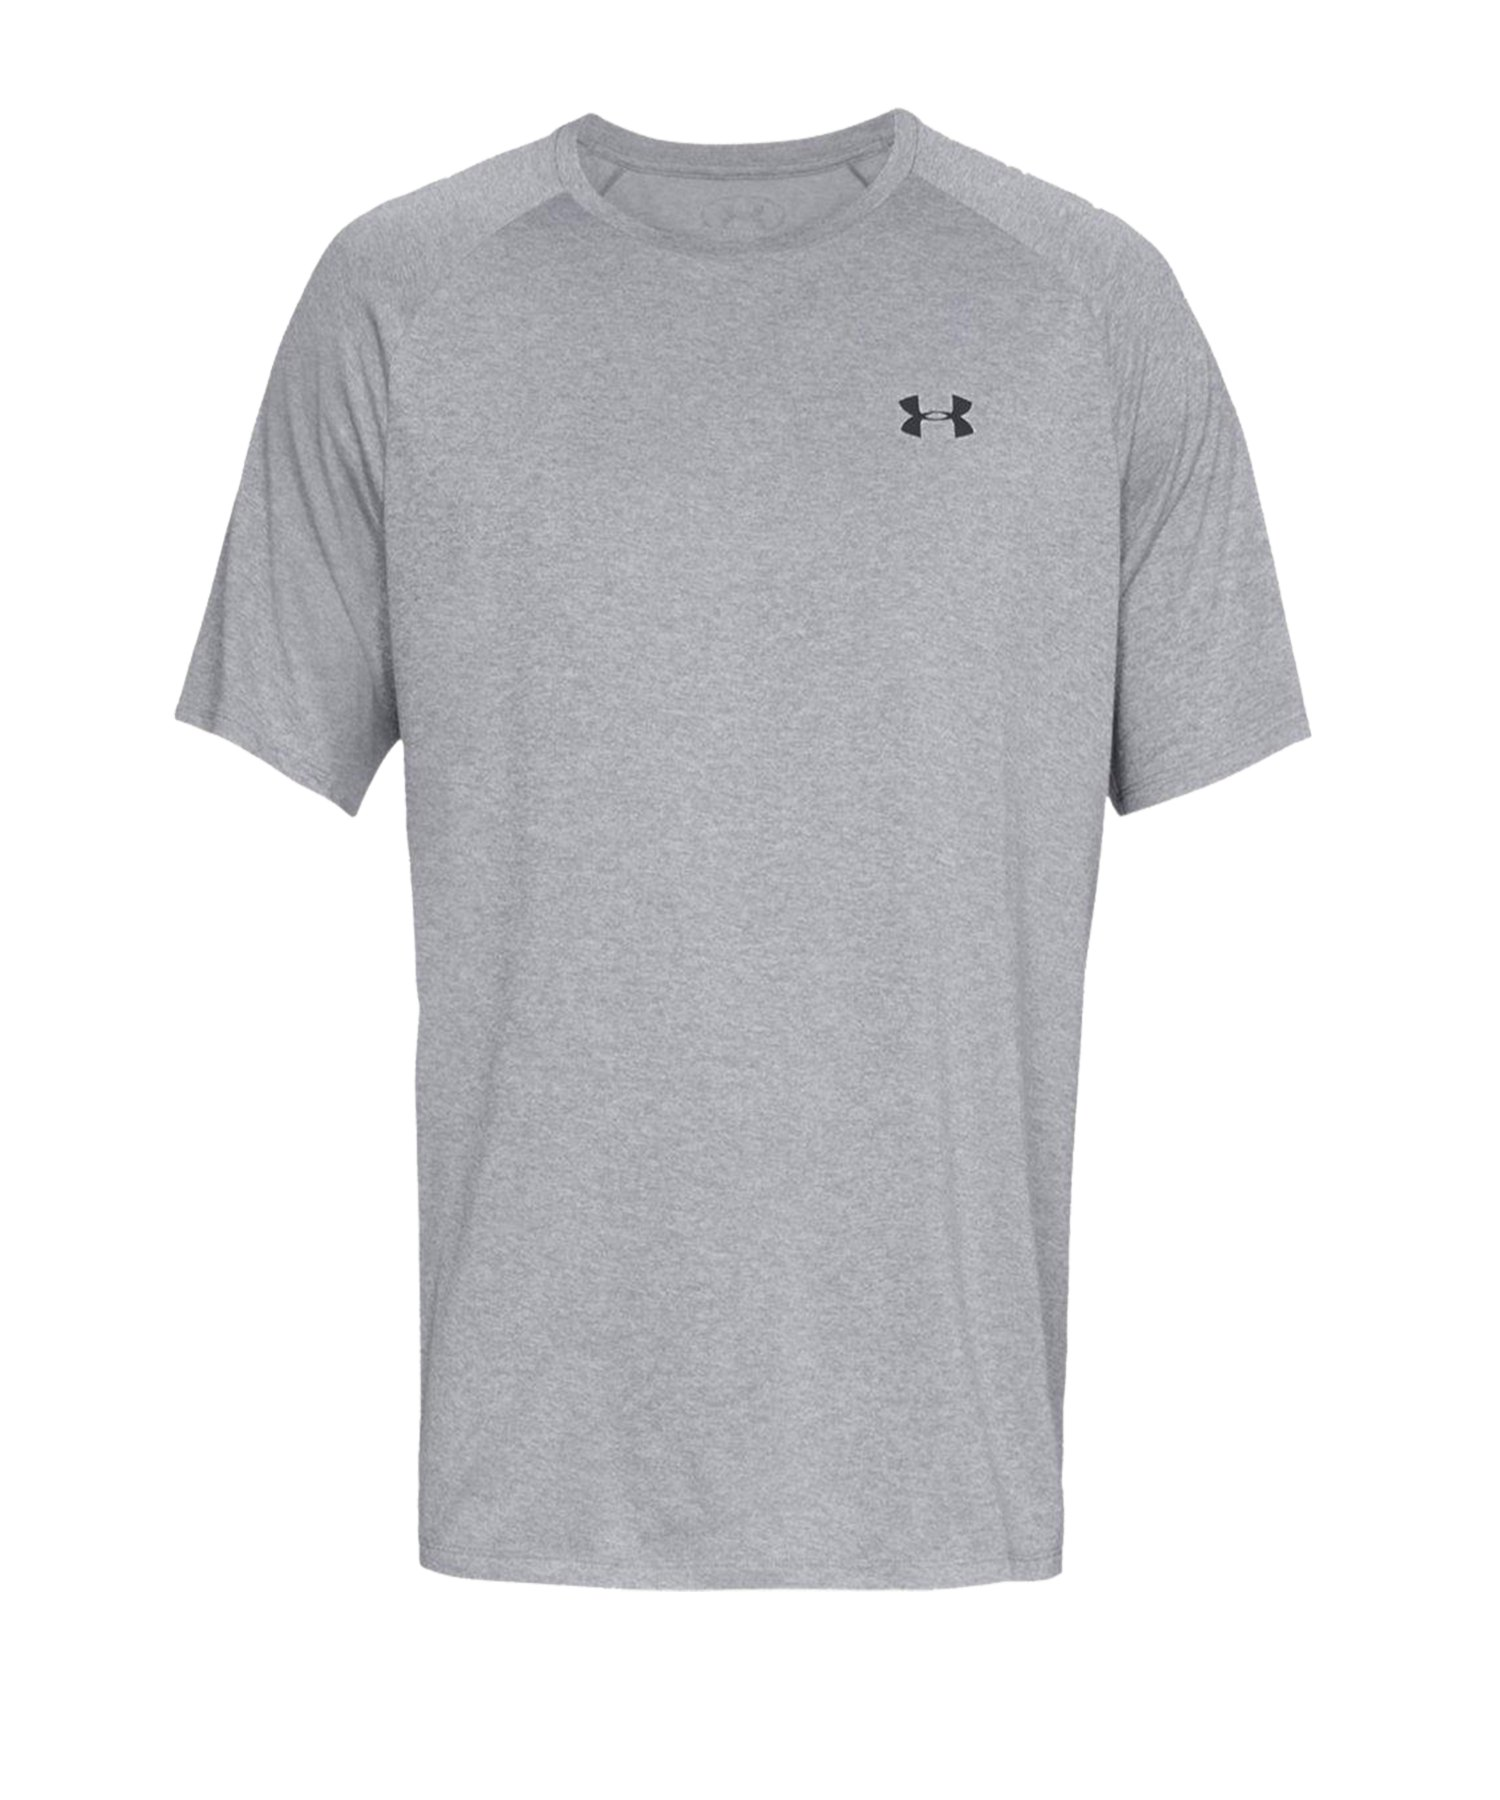 Under Armour Tech T-Shirt Grau F036 - grau